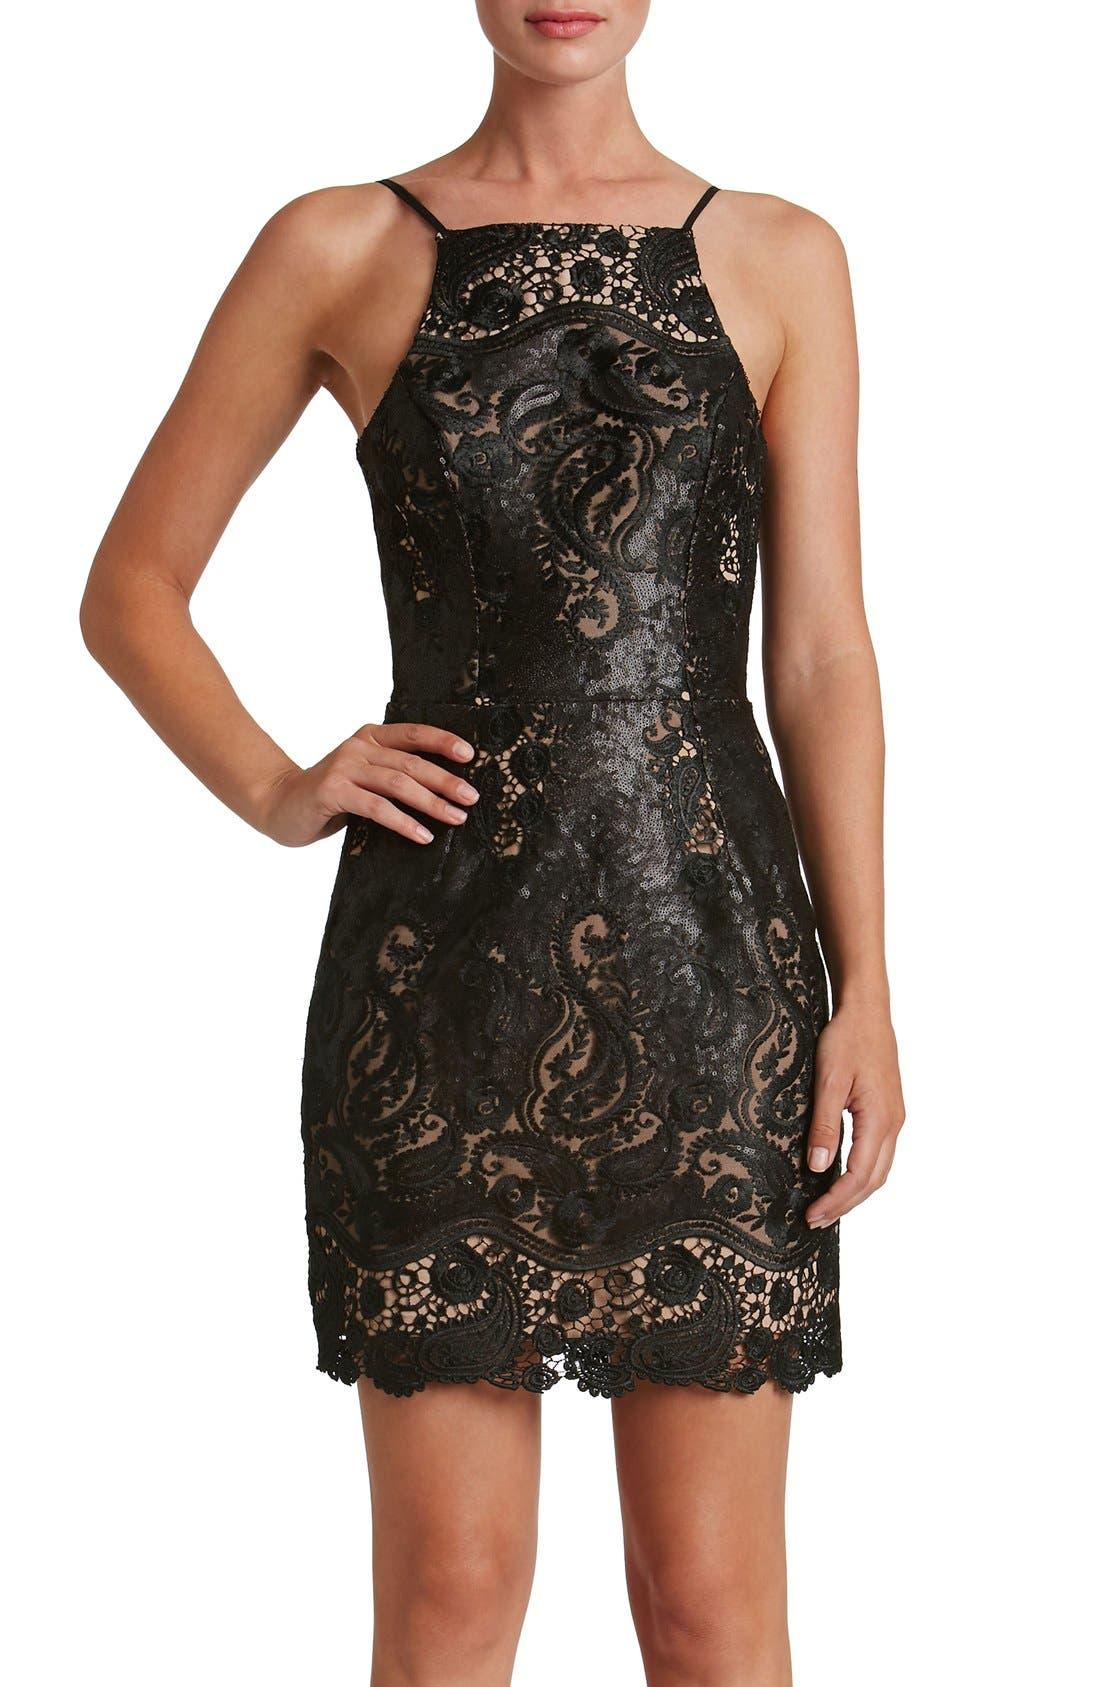 Alternate Image 1 Selected - Dress the Population Julie Sequin Lace Sheath Dress